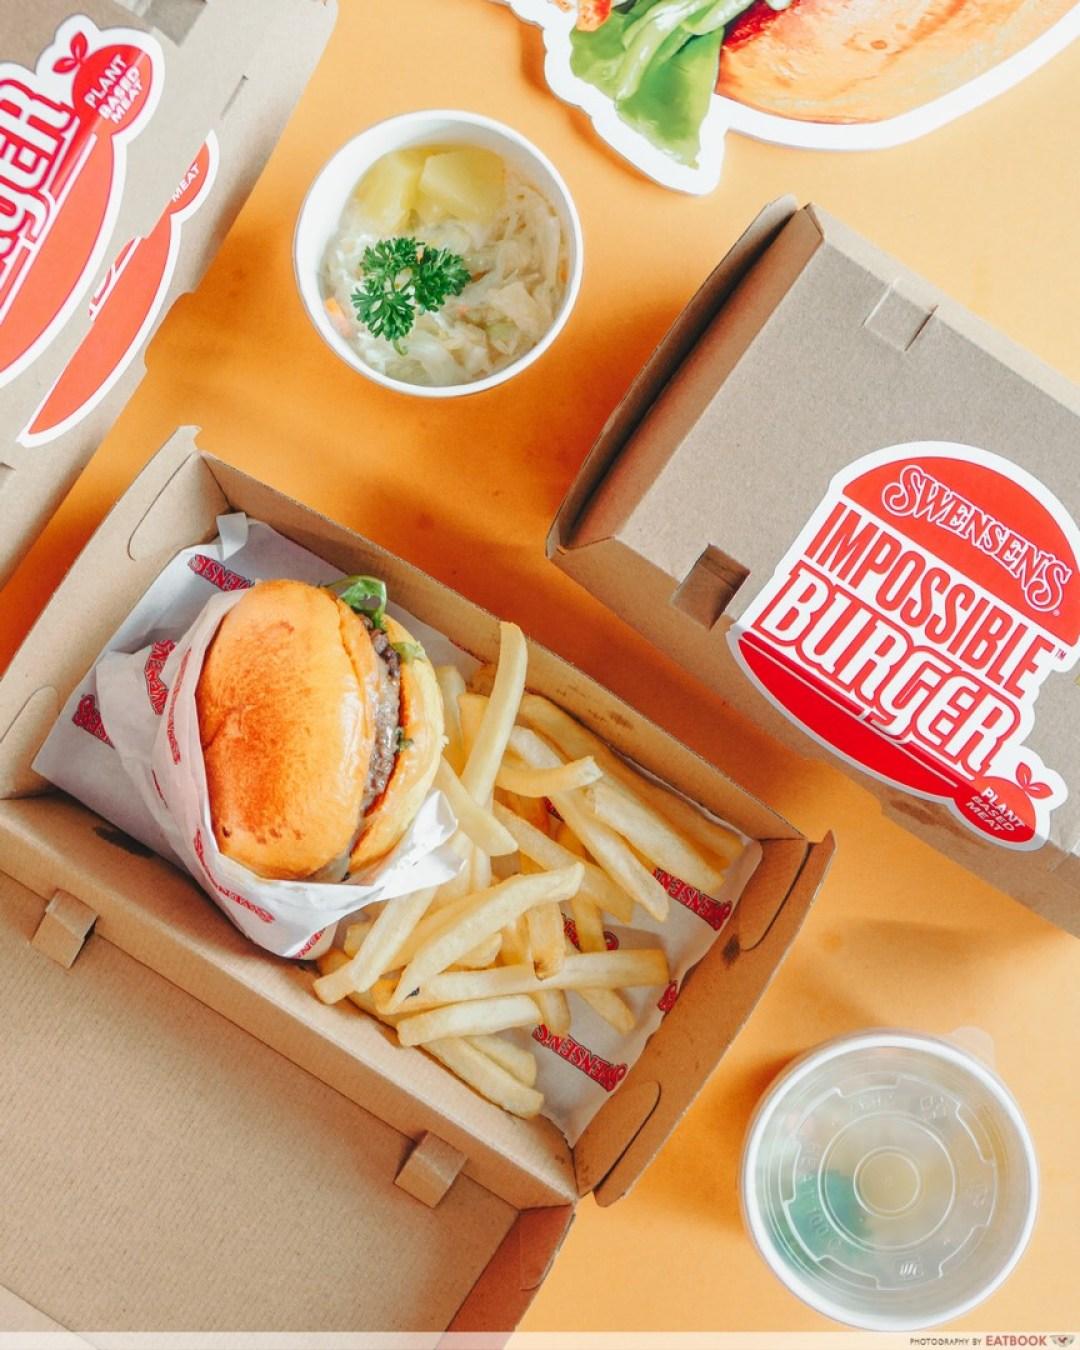 impossible meat online - swensens burger